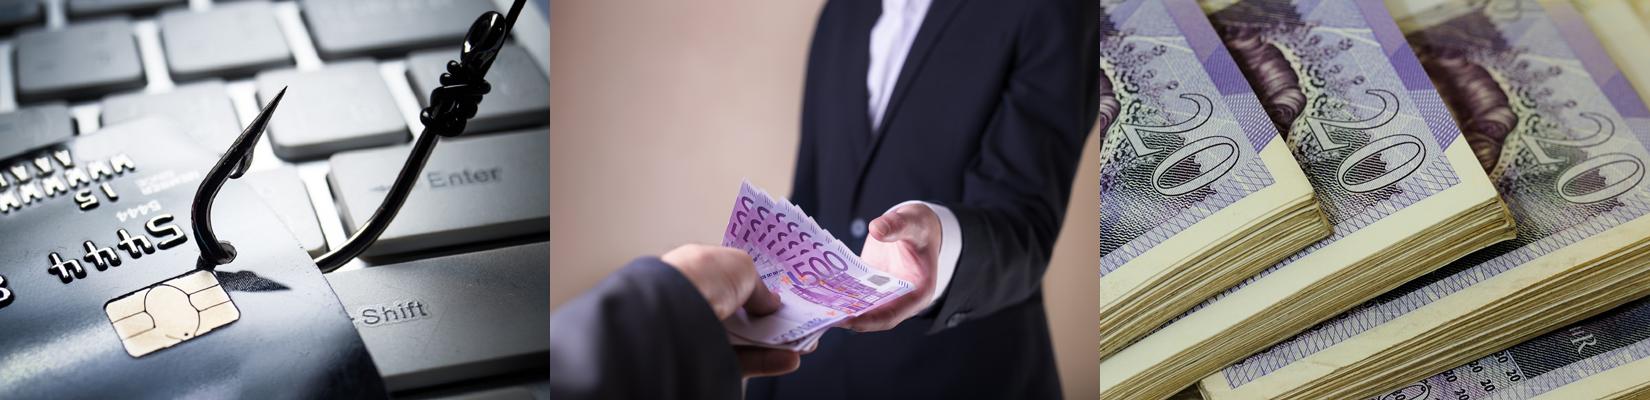 Anti-Money Laundering and Terrorist Financing